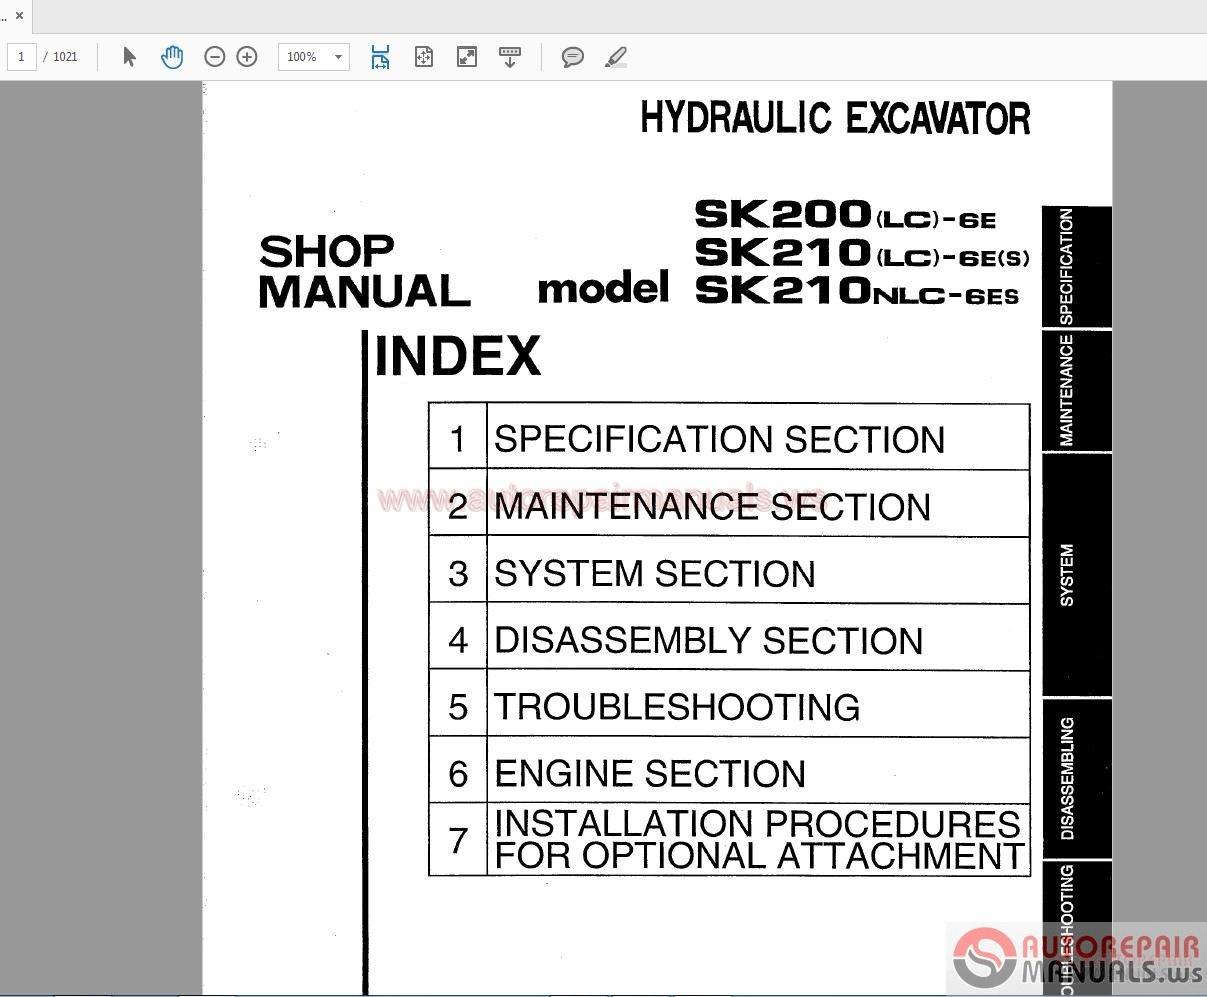 Kobelco Hydraulic Excavator Sk200 Sk210 6e S S5yn0017e Shop Manual Wiring Diagram More The Random Threads Same Category Sk250lc Parts S3lq04104ze01